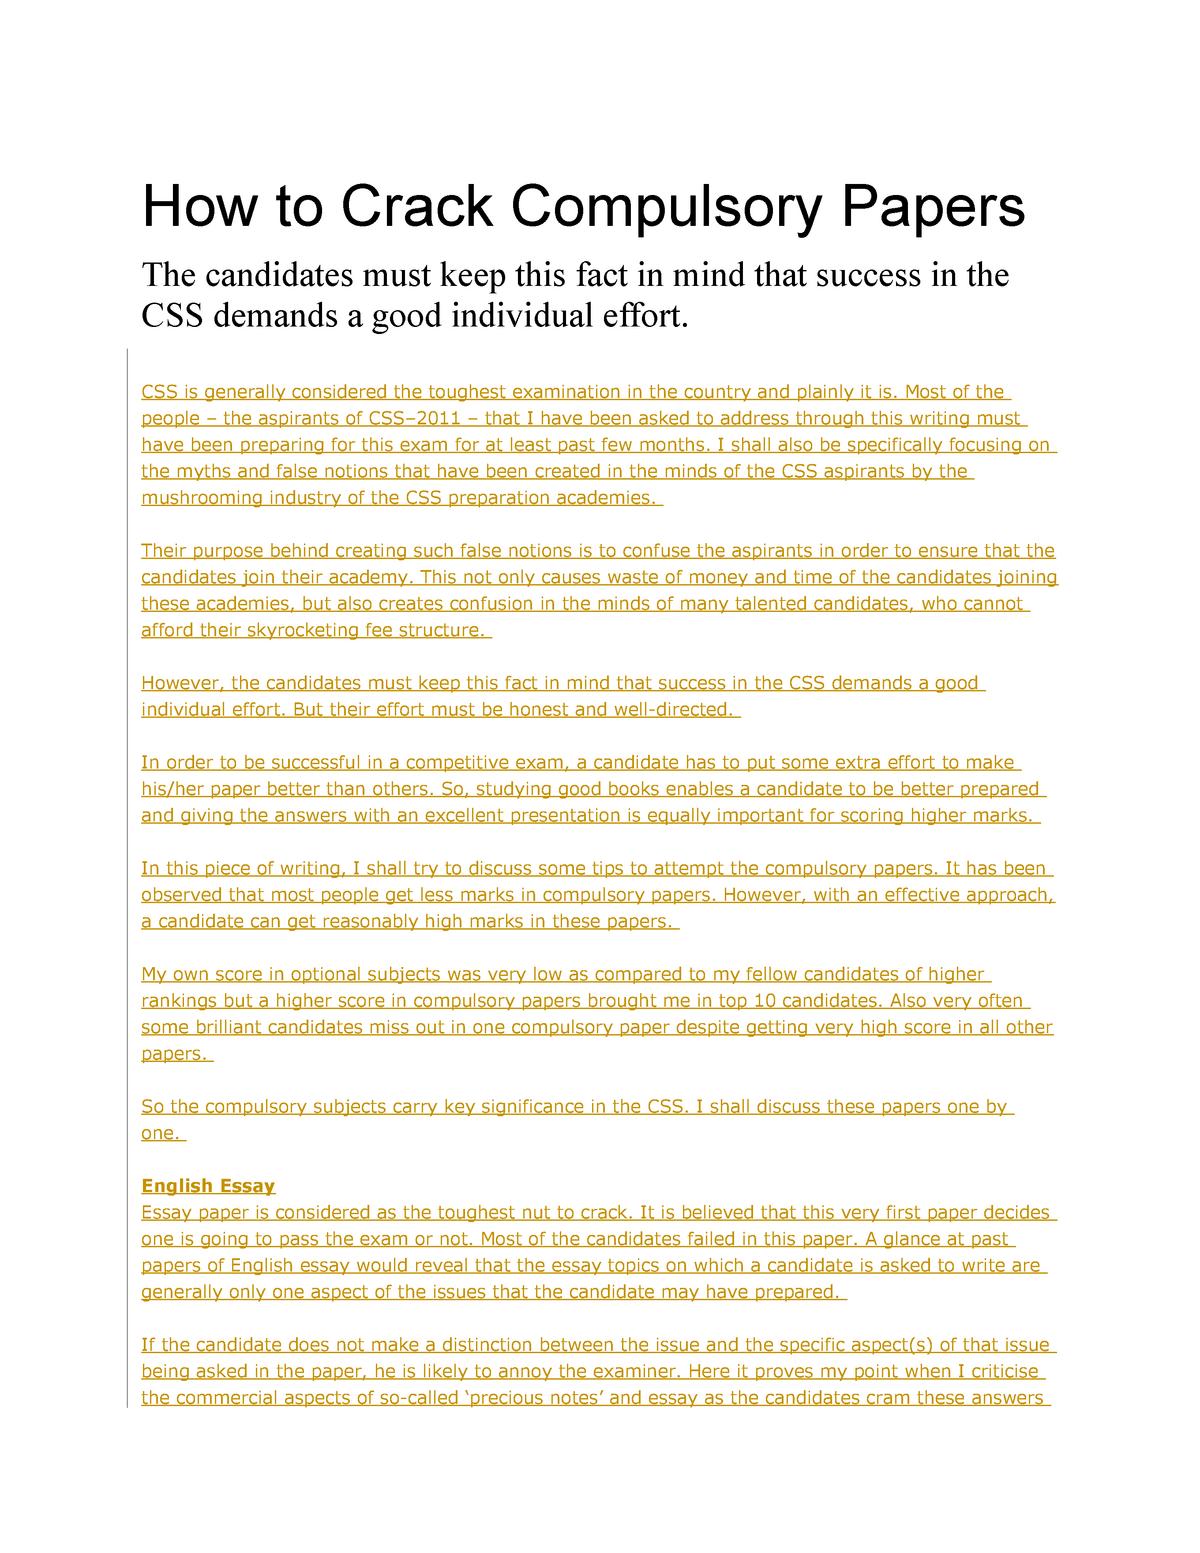 How to Crack Compulsory Papers - CSC 209 - StuDocu